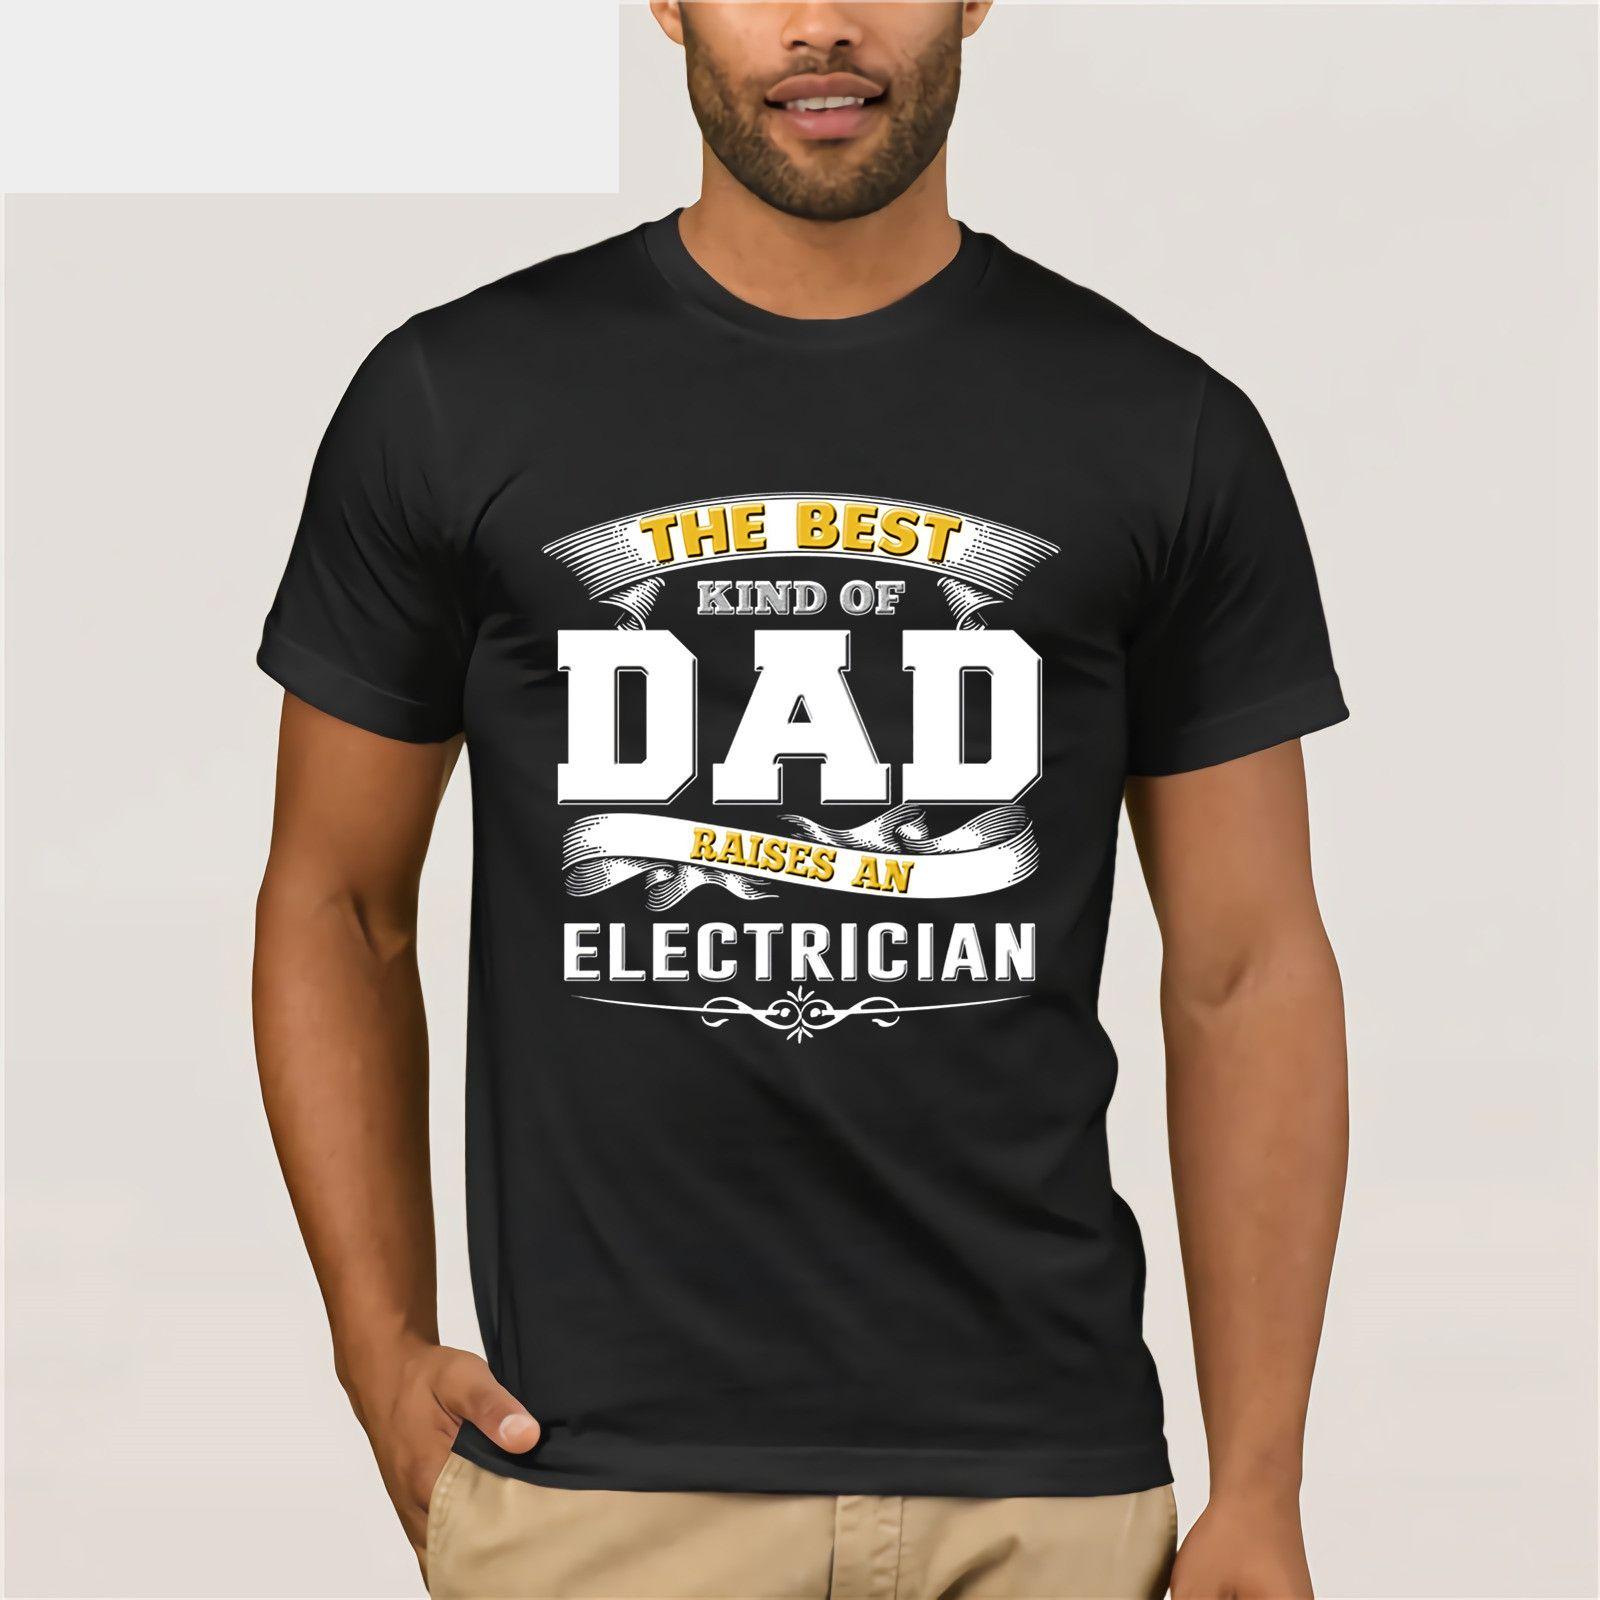 d234e6b1f Men's Electrician T Shirt Funny Dad Tee Papa Work Men Shirt Funny black men tee  shirt cotton free